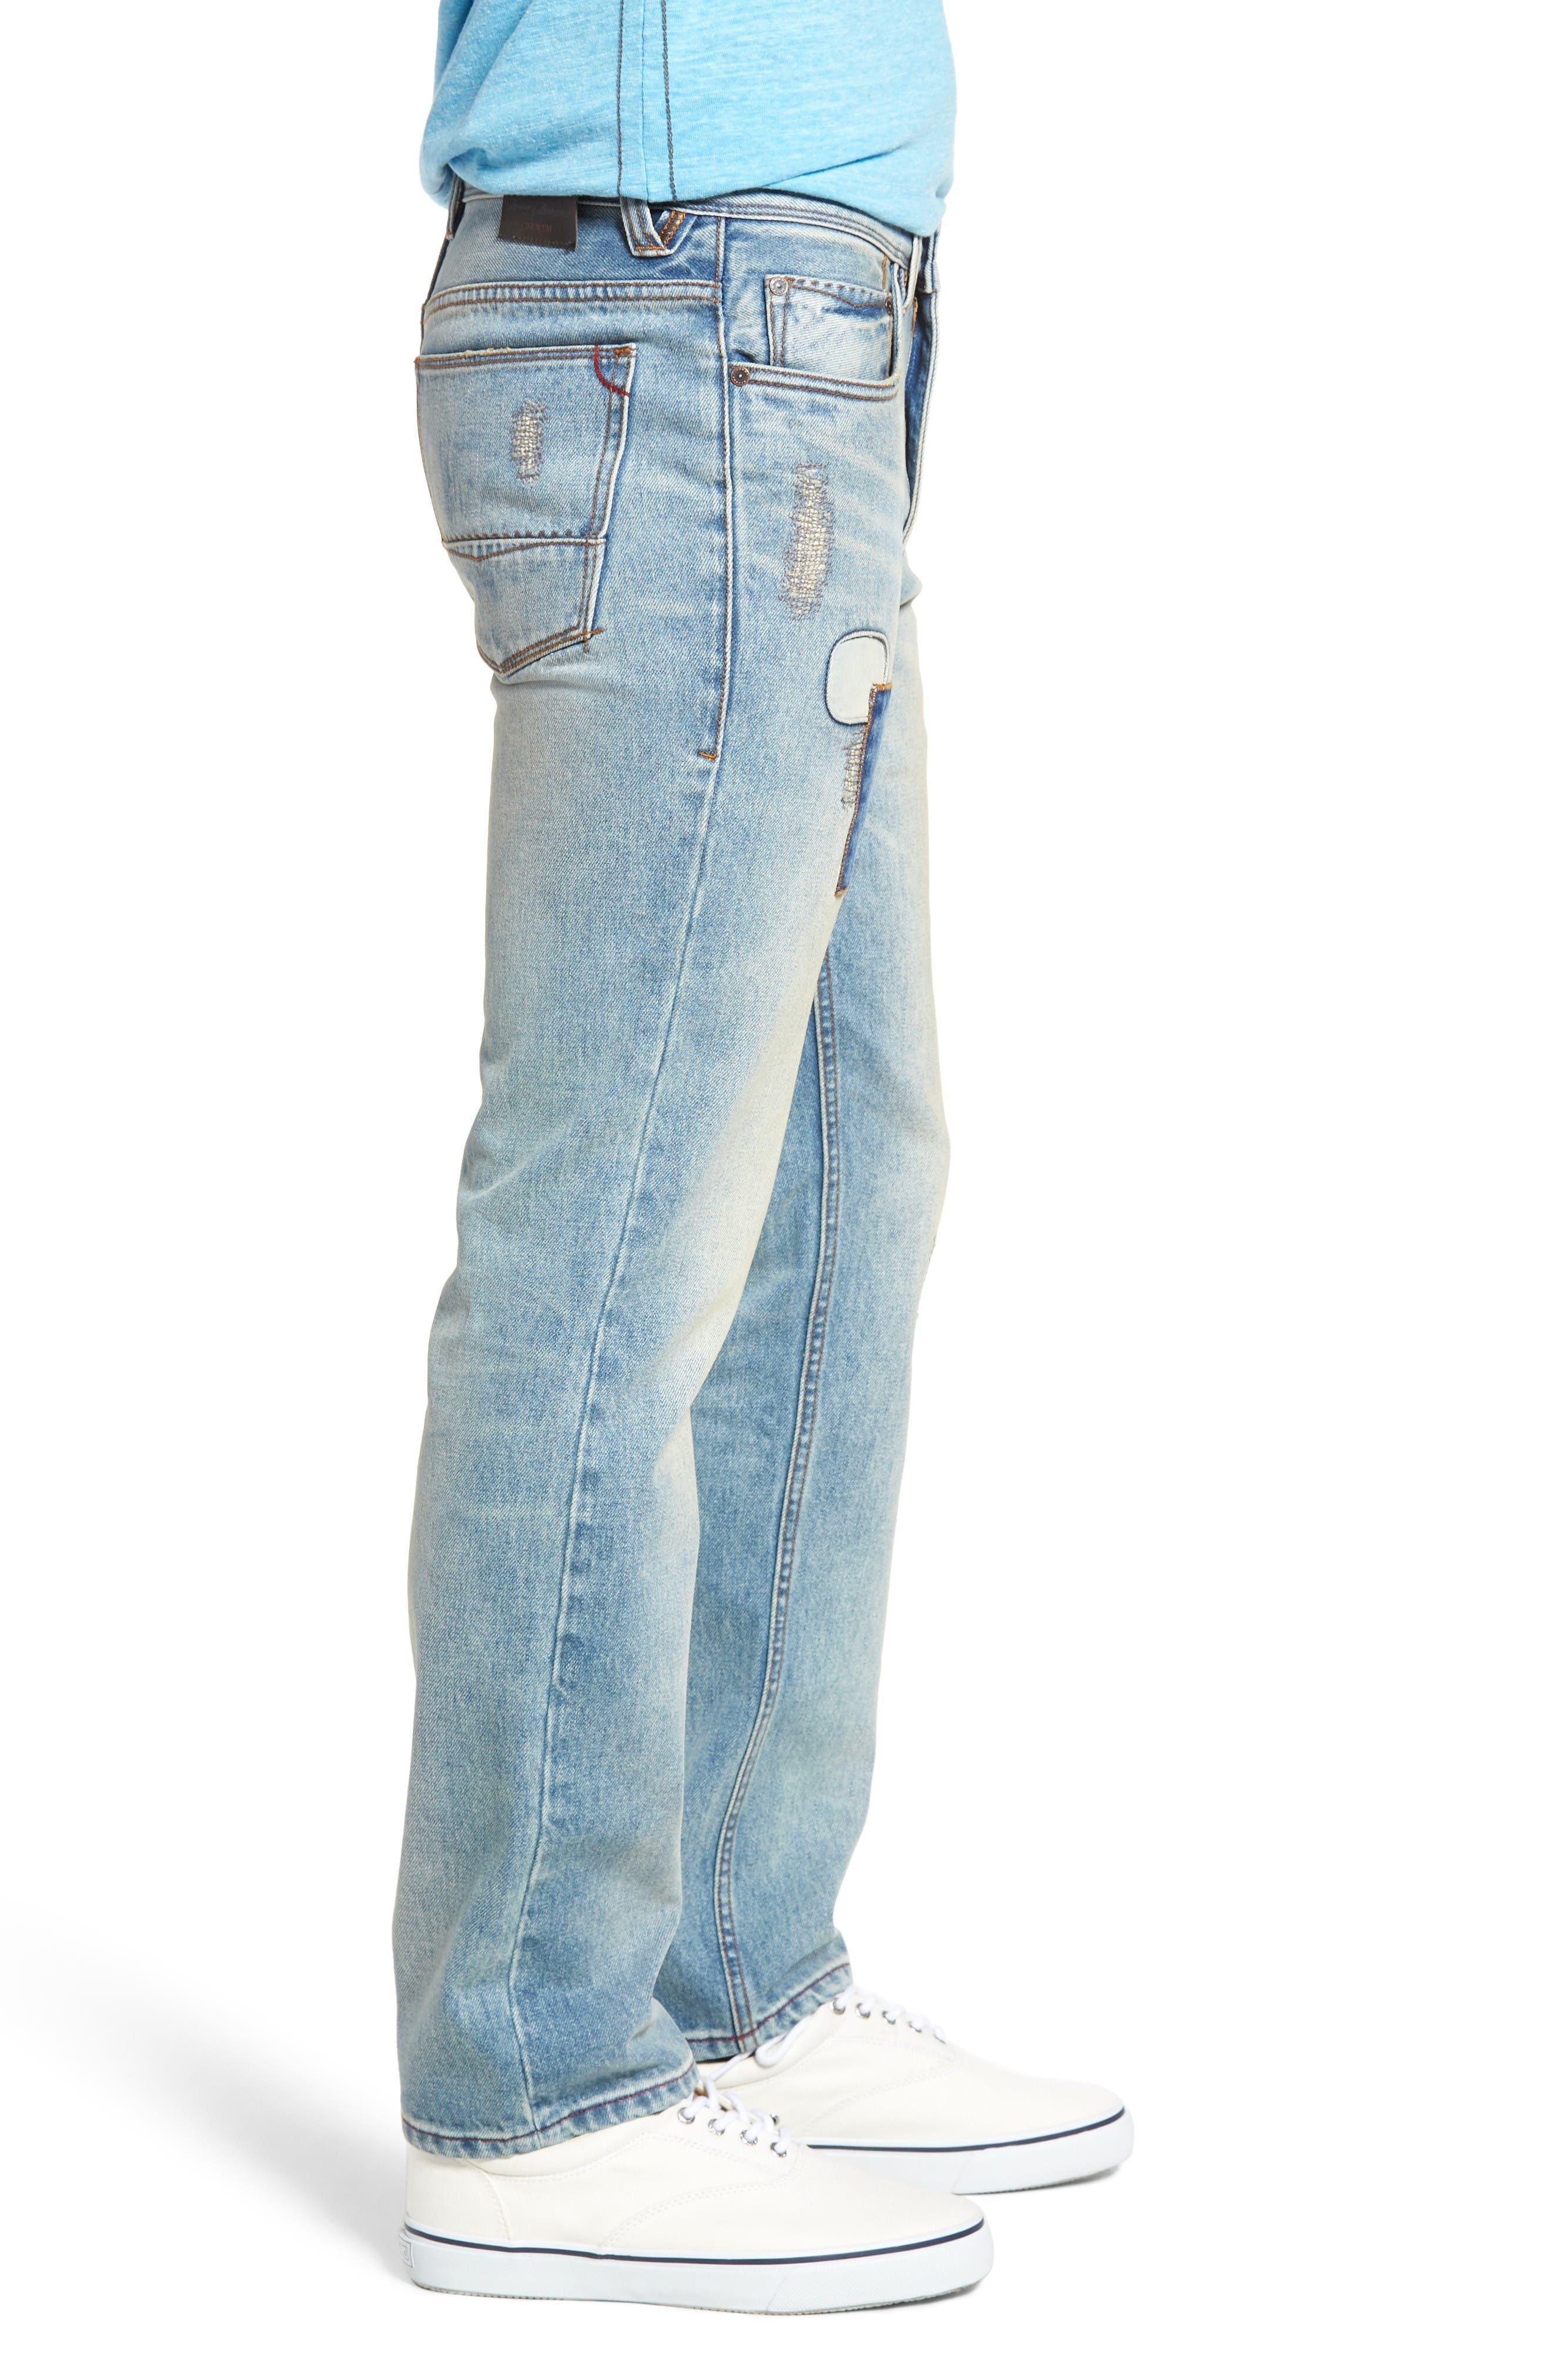 Castaway Slim Fit Jeans,                             Alternate thumbnail 3, color,                             Bleached Vintage Wash